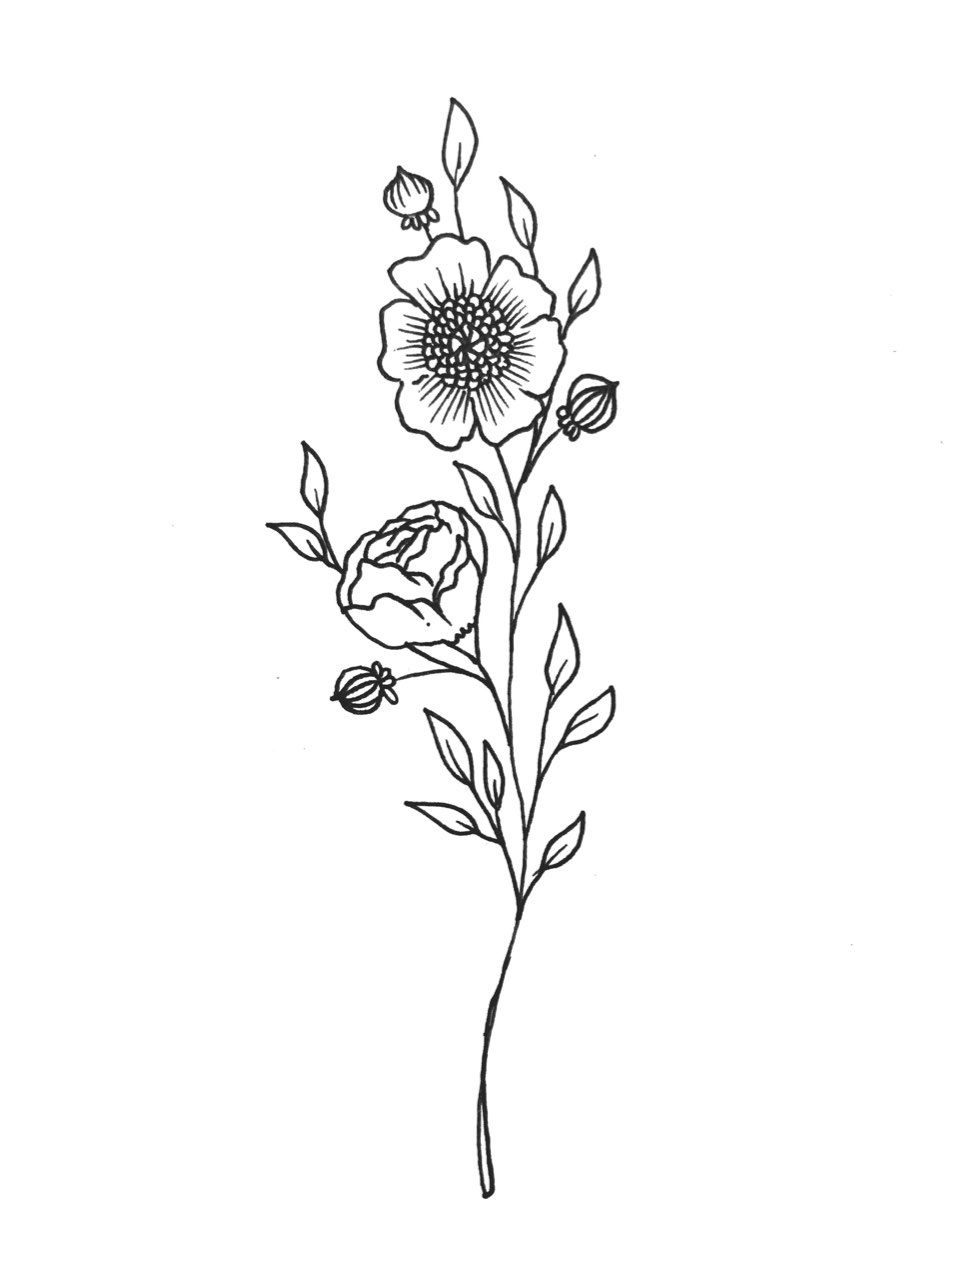 Poppy Flowers Tattoo Design Illustration By Liza Sie Bouquet Tattoo Flower Tattoos Tattoos